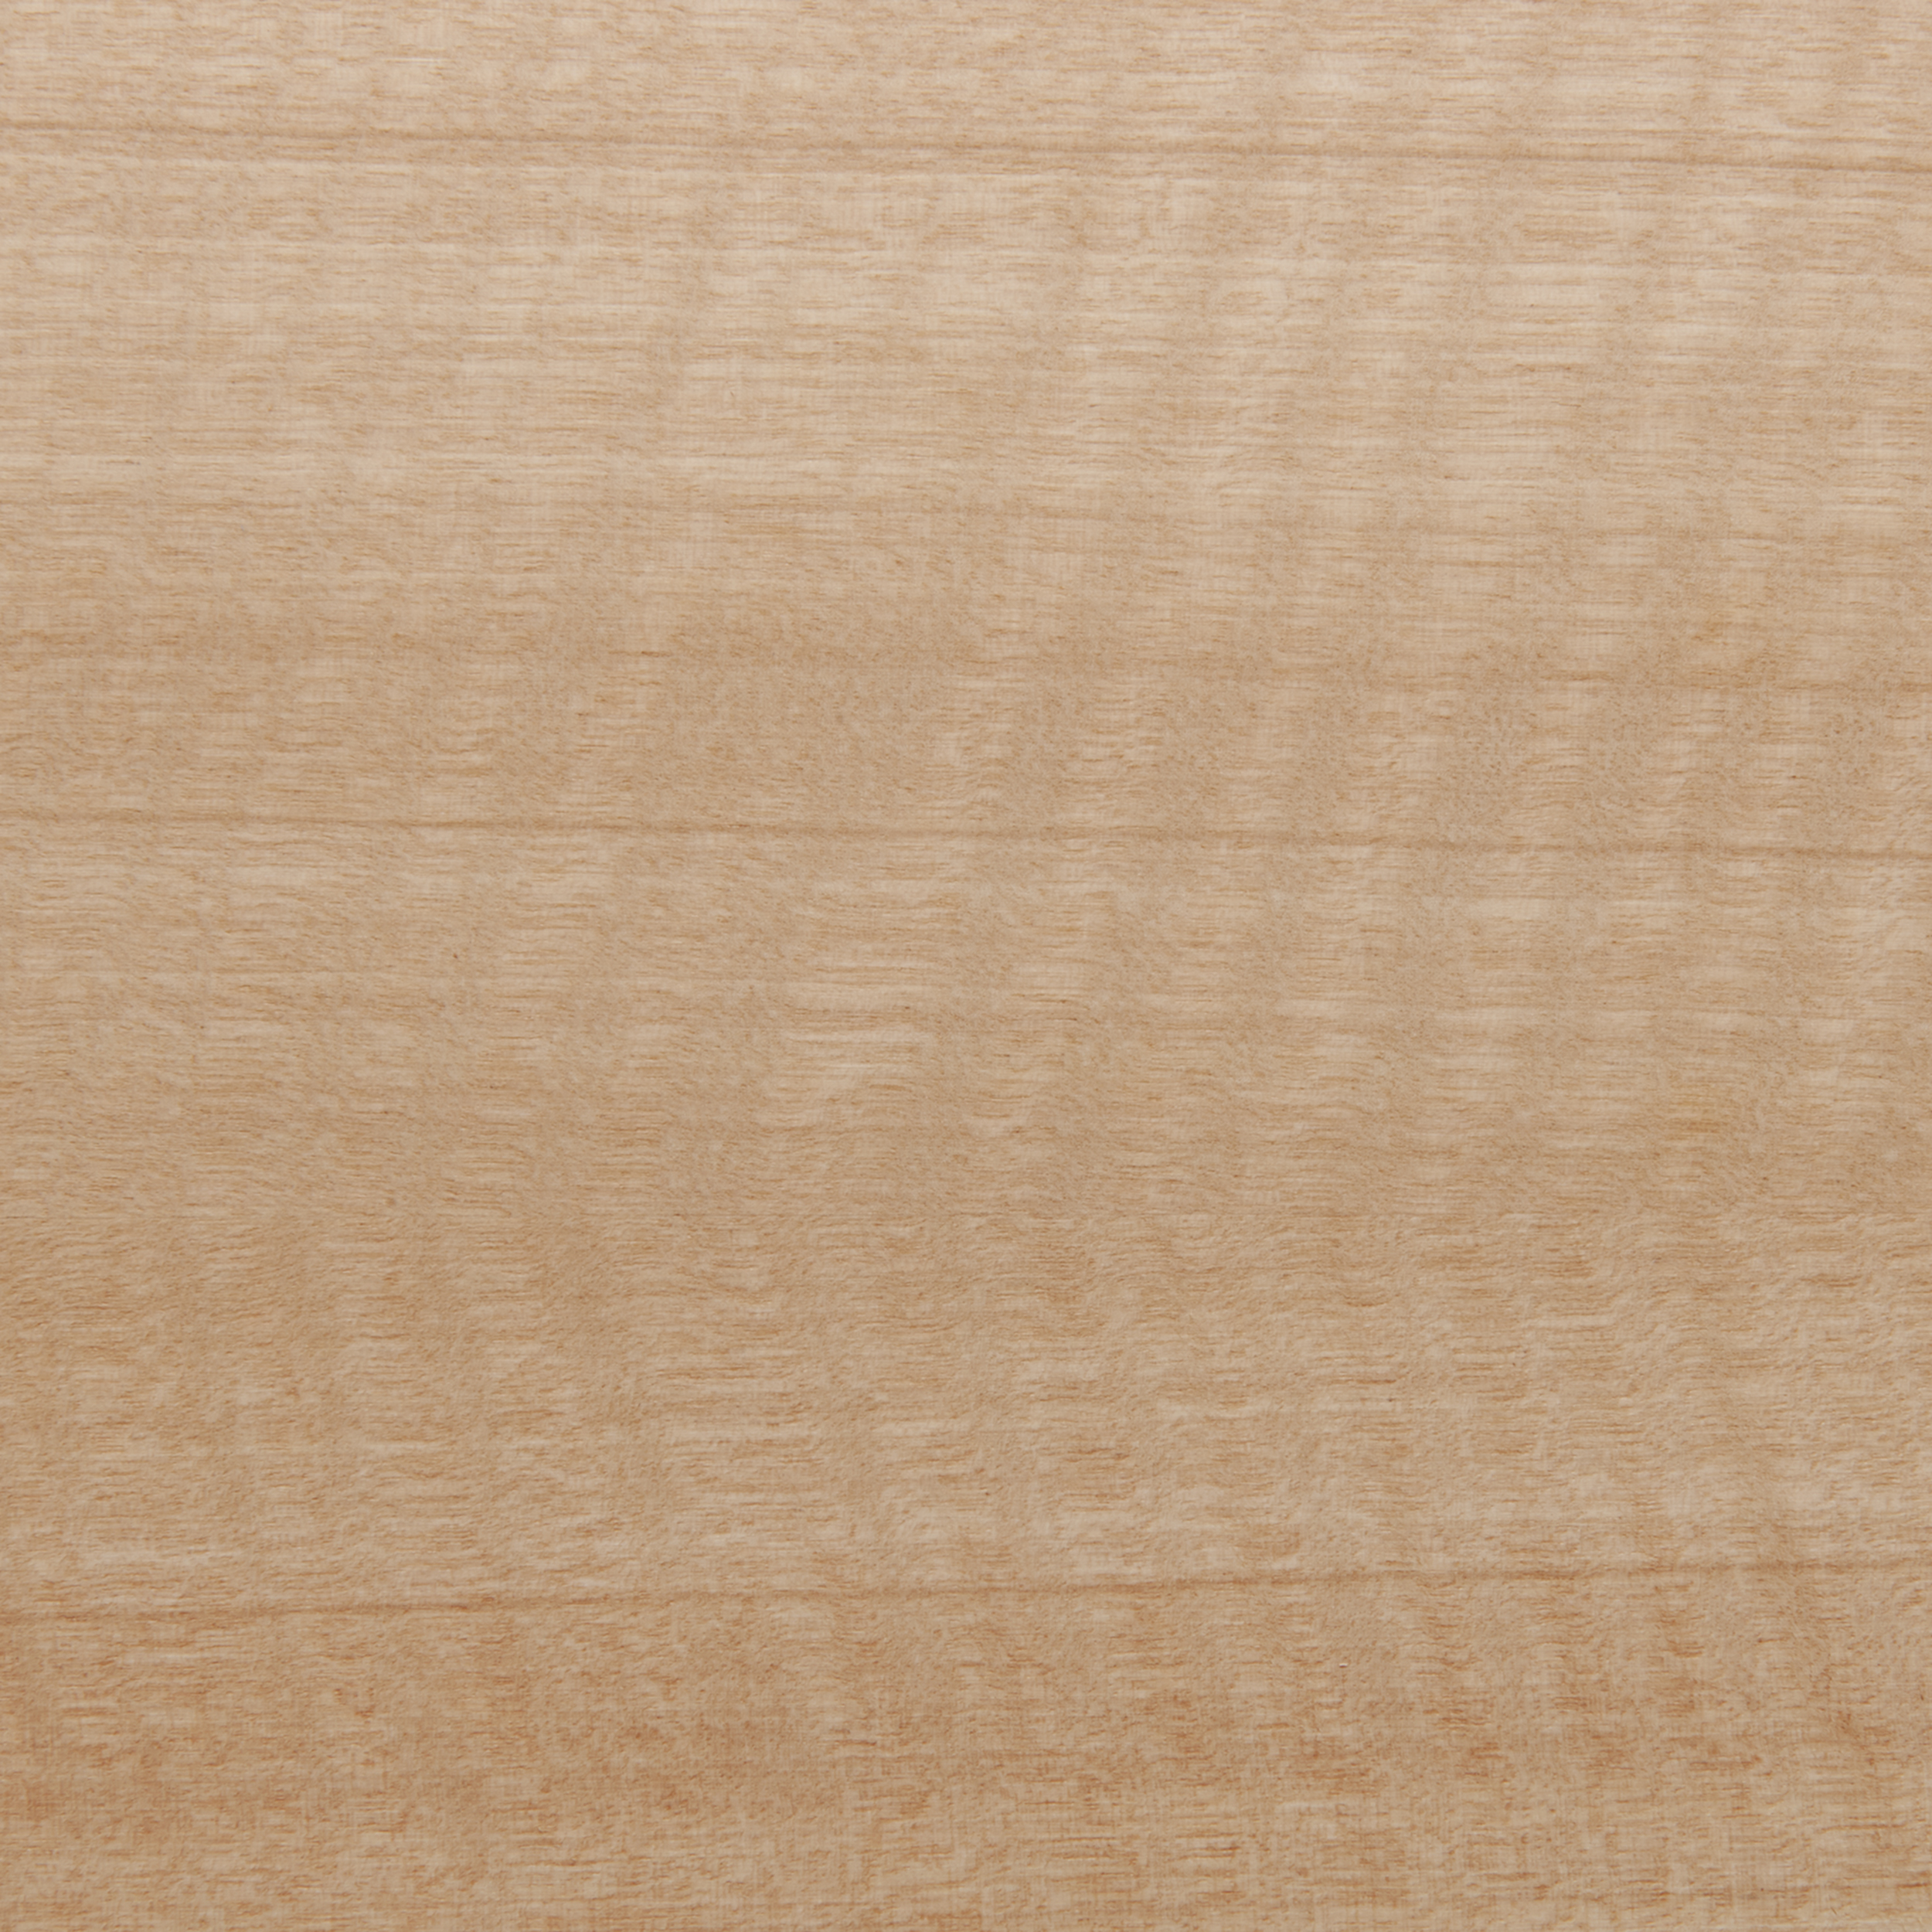 Anigre, Quartersawn Heavy Figure 4'X8' Veneer Sheet, 3M PSA Backed